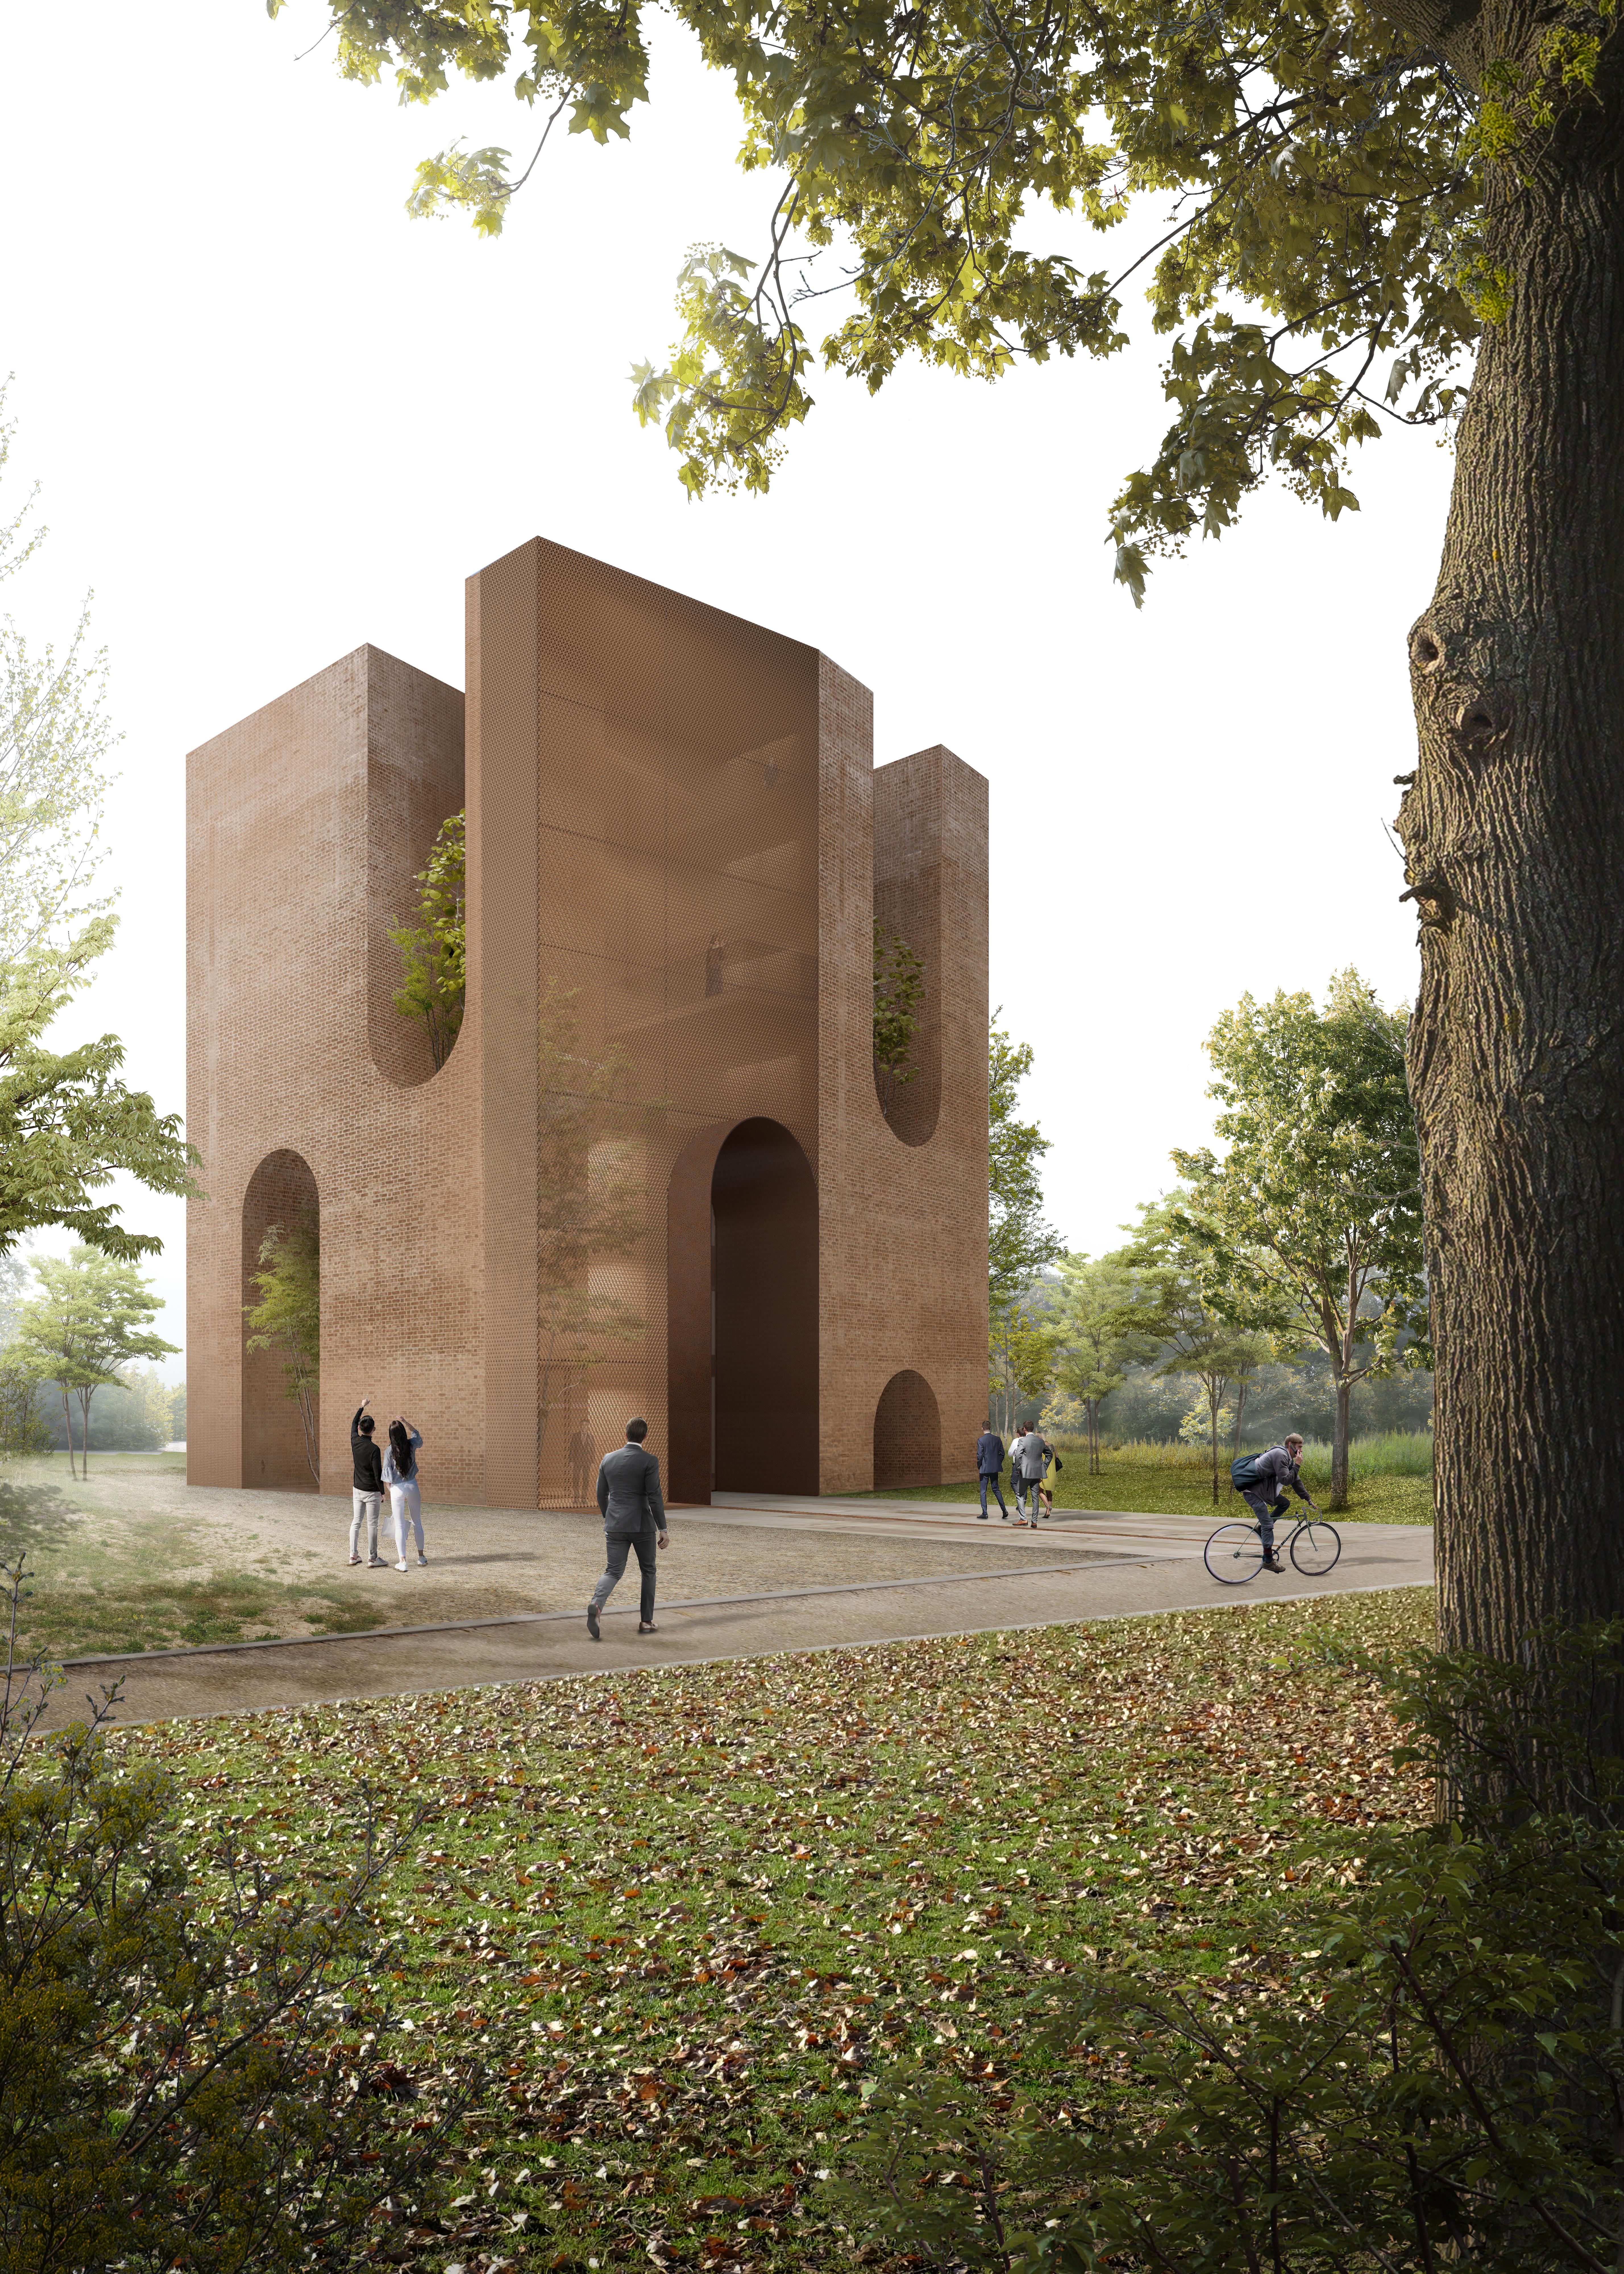 LEIEDAL_Exterieur ∏ C+S Architects +MMA Bart Macken Eef Boeckx.jpg